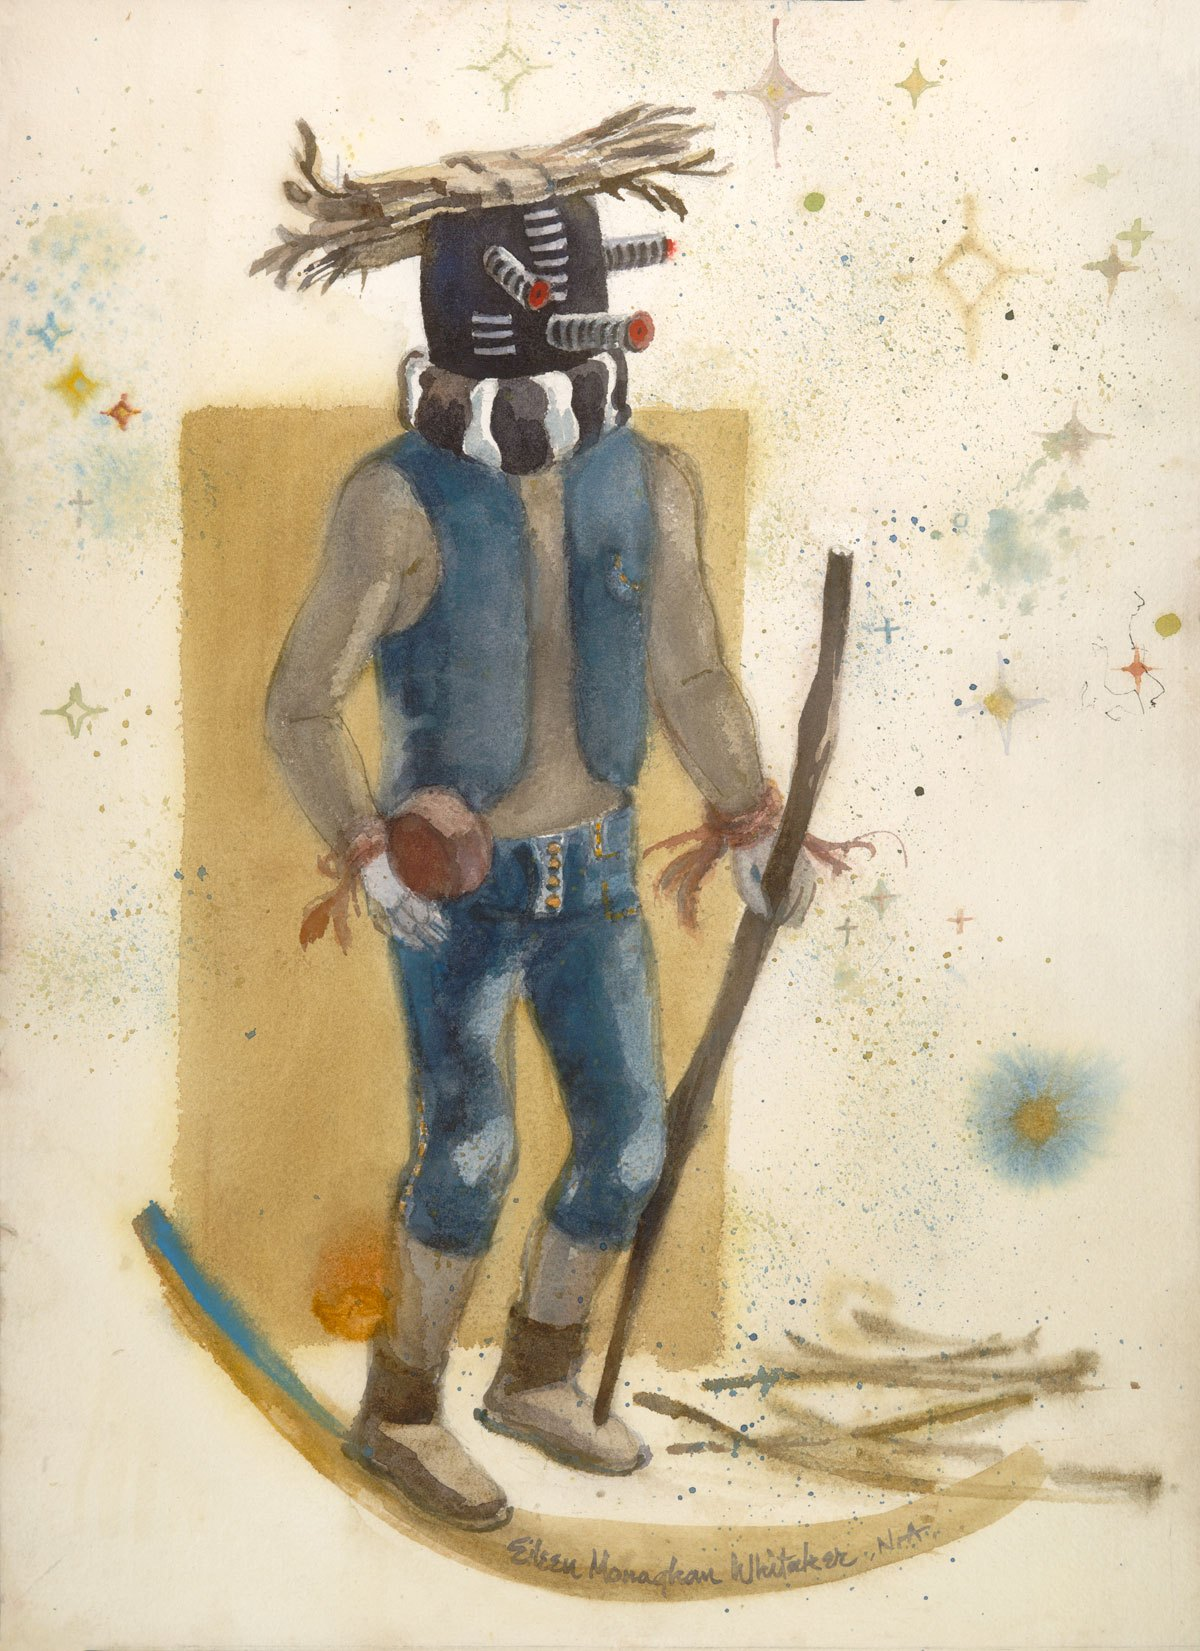 """Kachina Mocking"" 1983 © Eileen Monaghan Whitaker N.A. (size unknown) Watercolor"